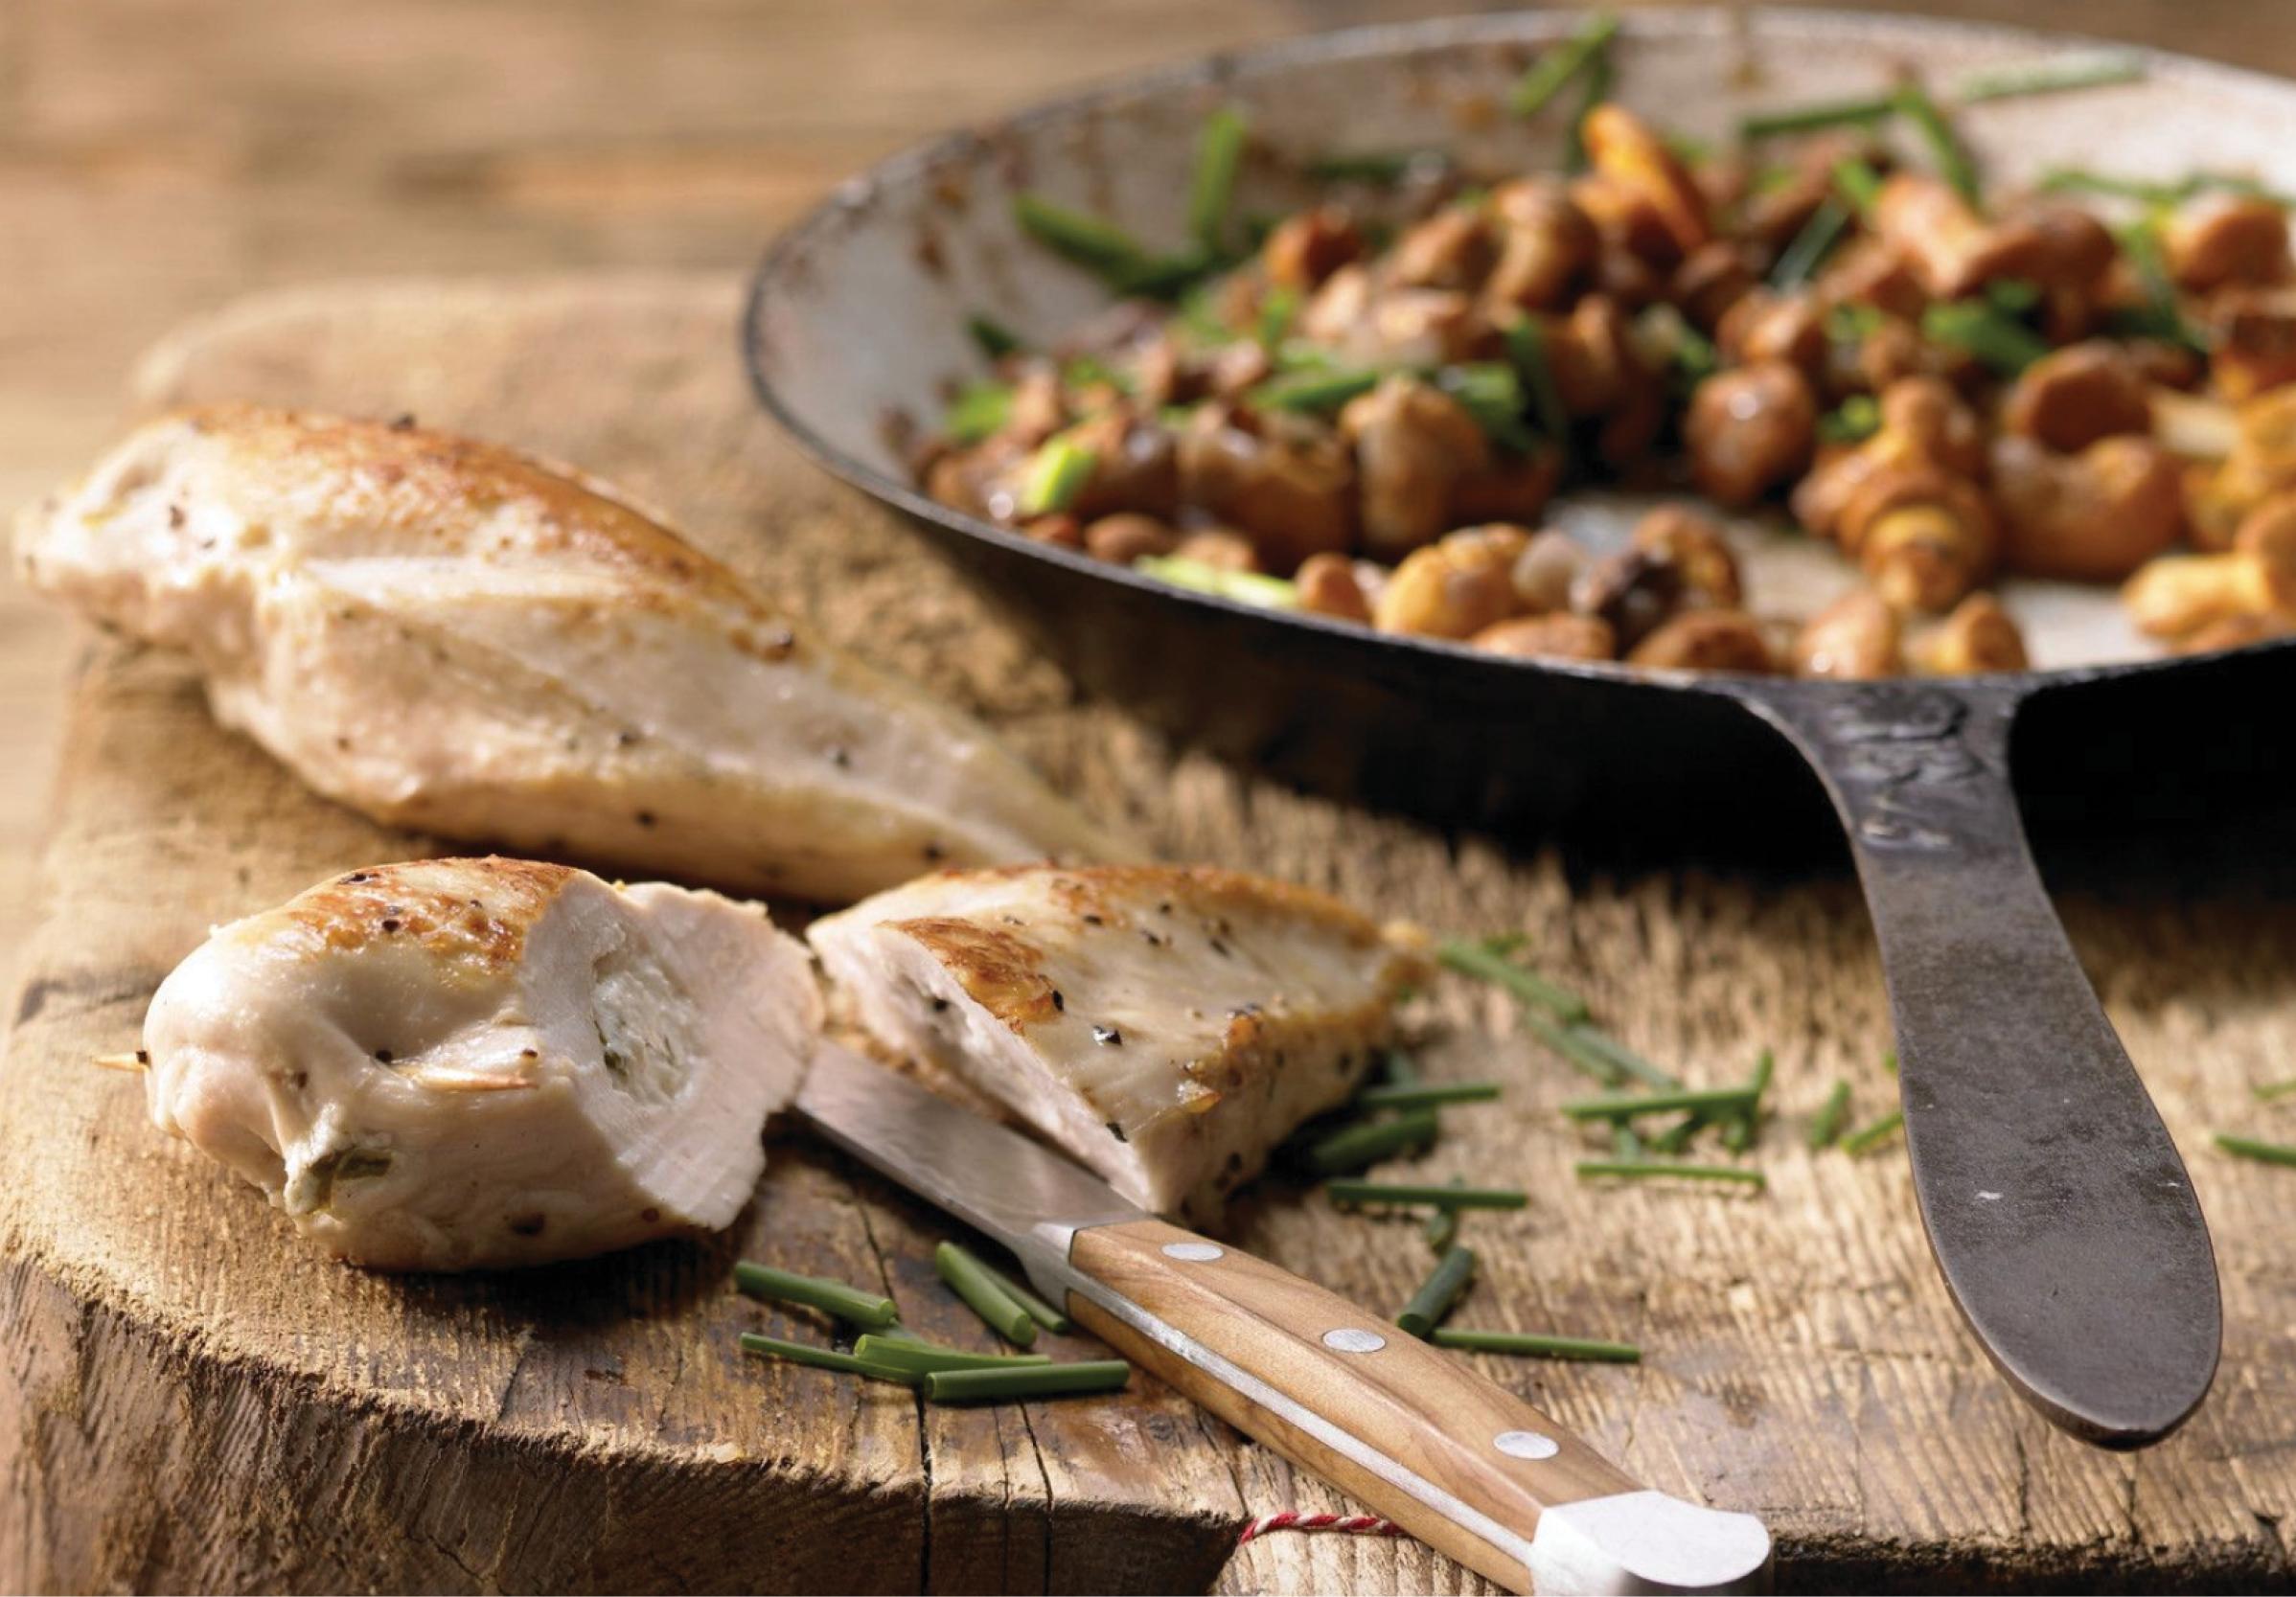 https://eatsmarter.com/recipes/goat-cheese-stuffed-chicken-breast